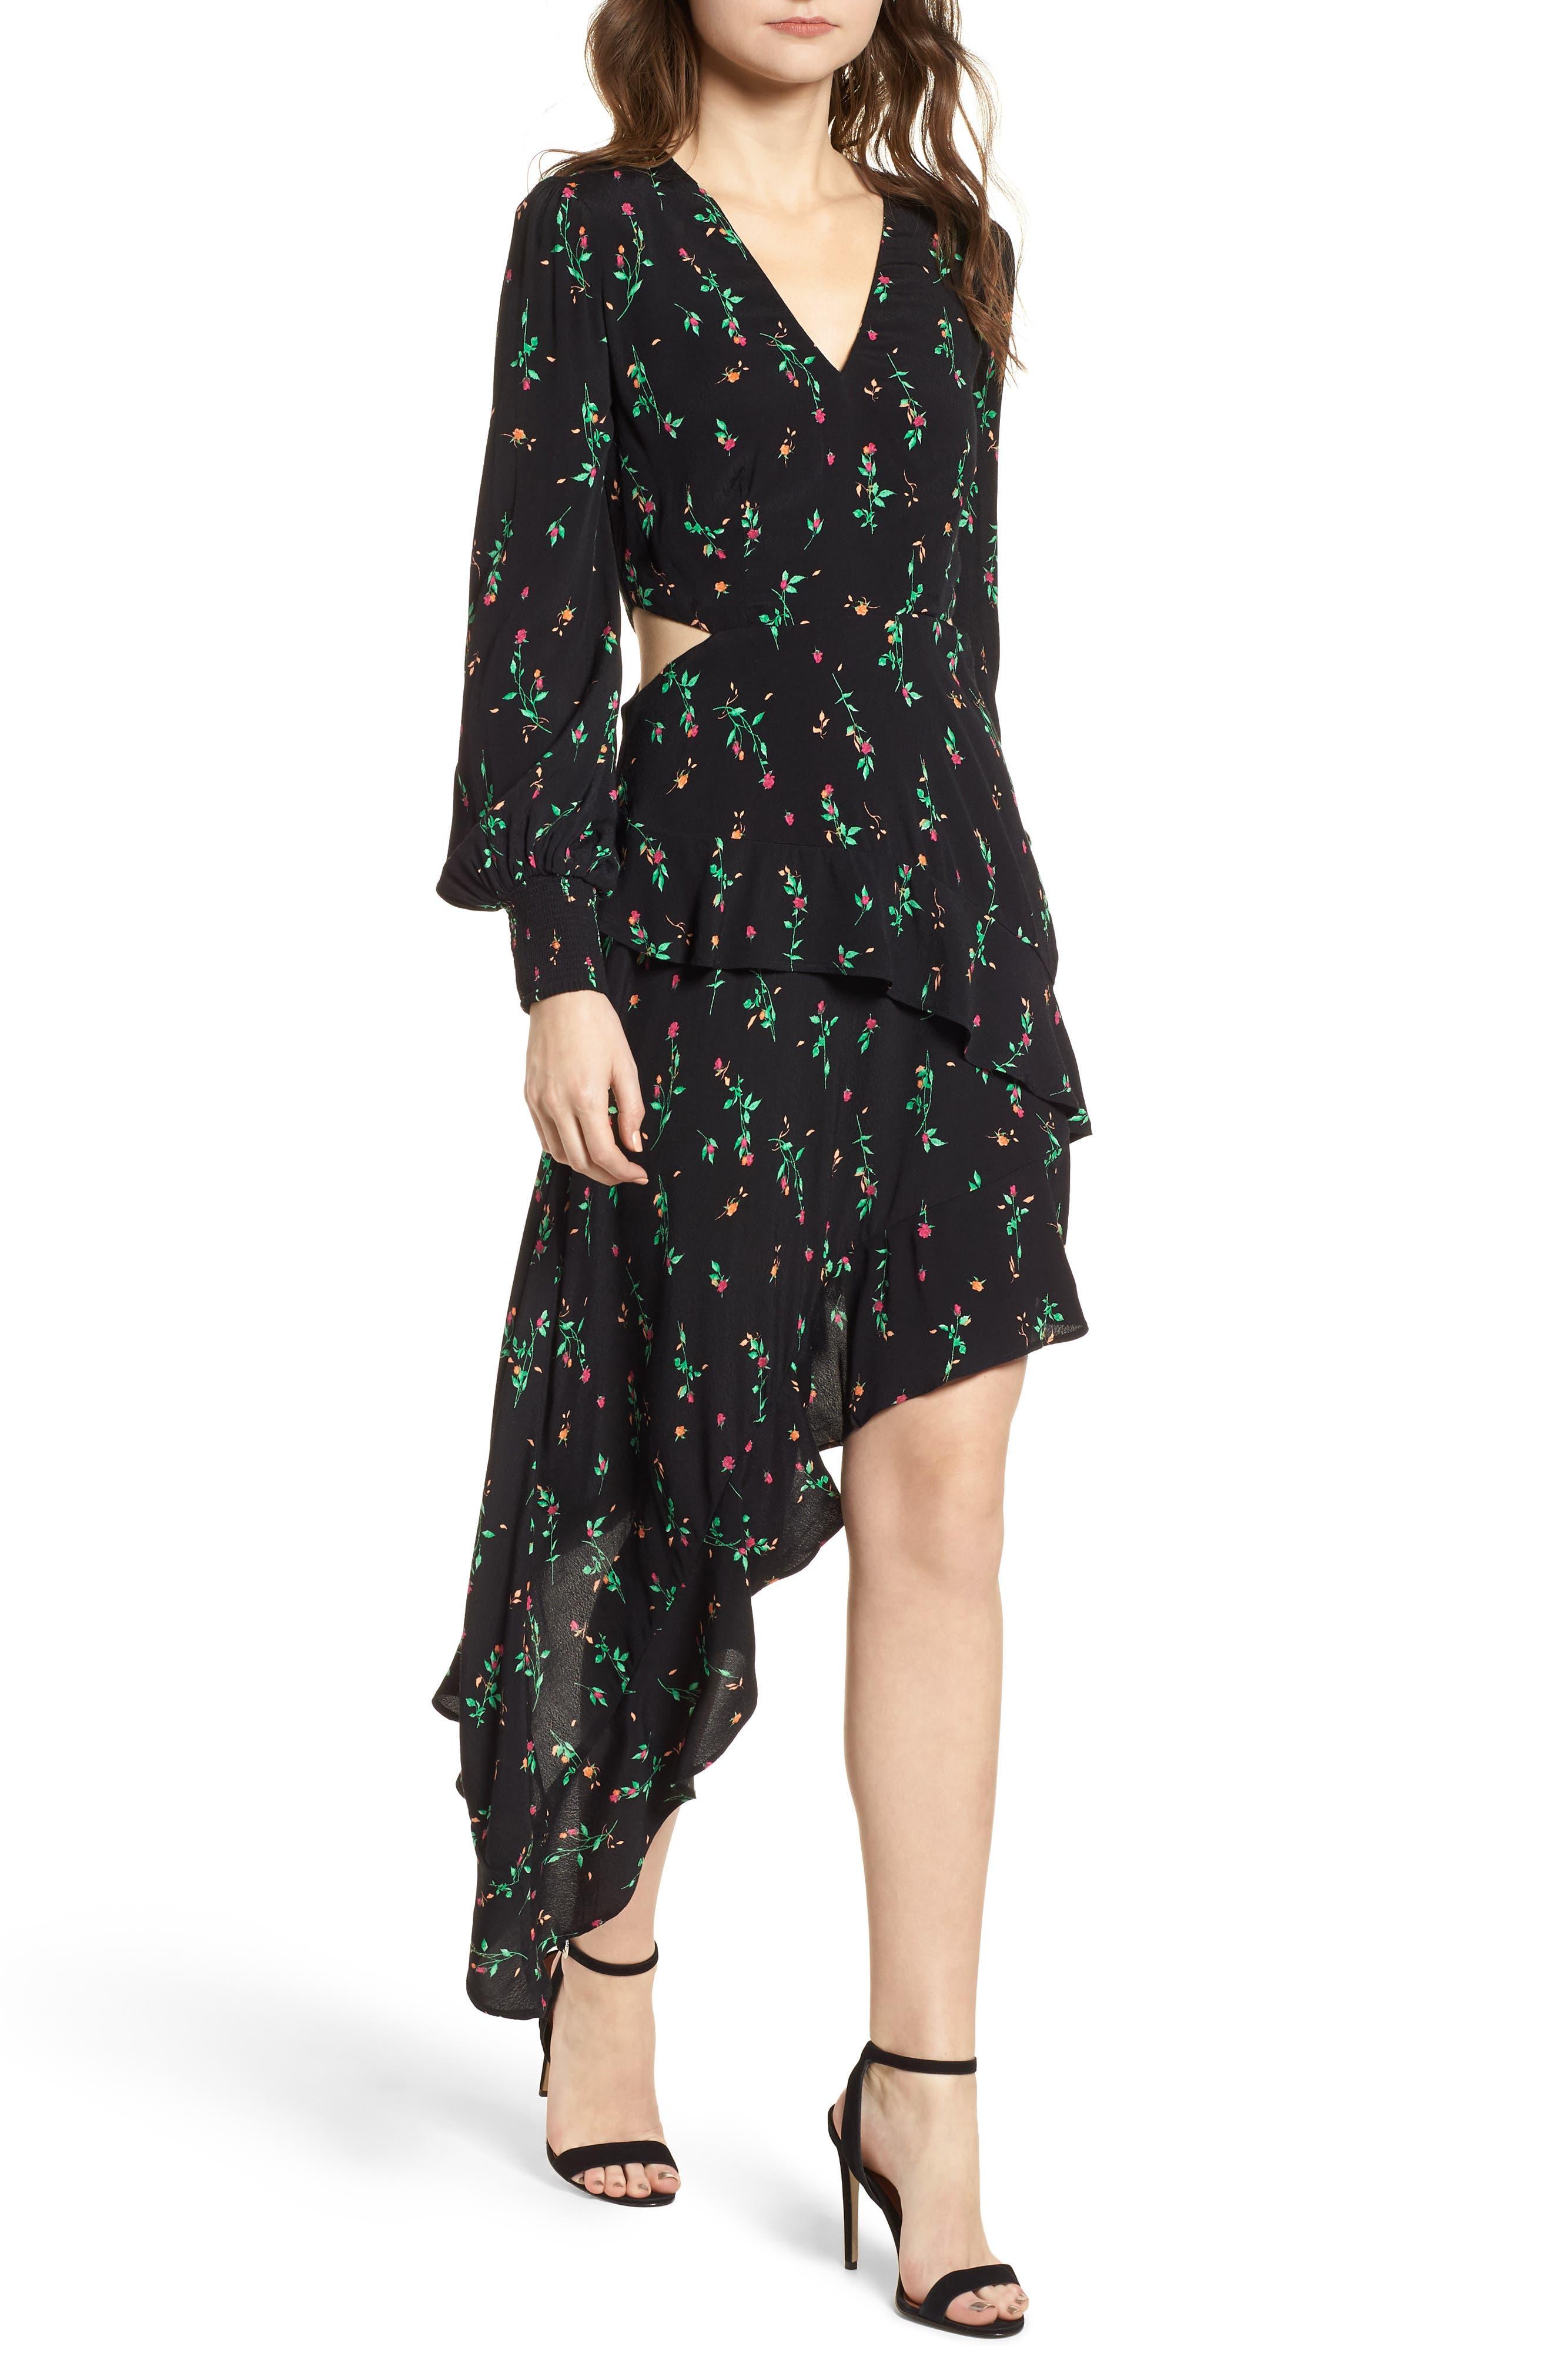 Mabel Cutout Asymmetrical Dress,                             Main thumbnail 1, color,                             001